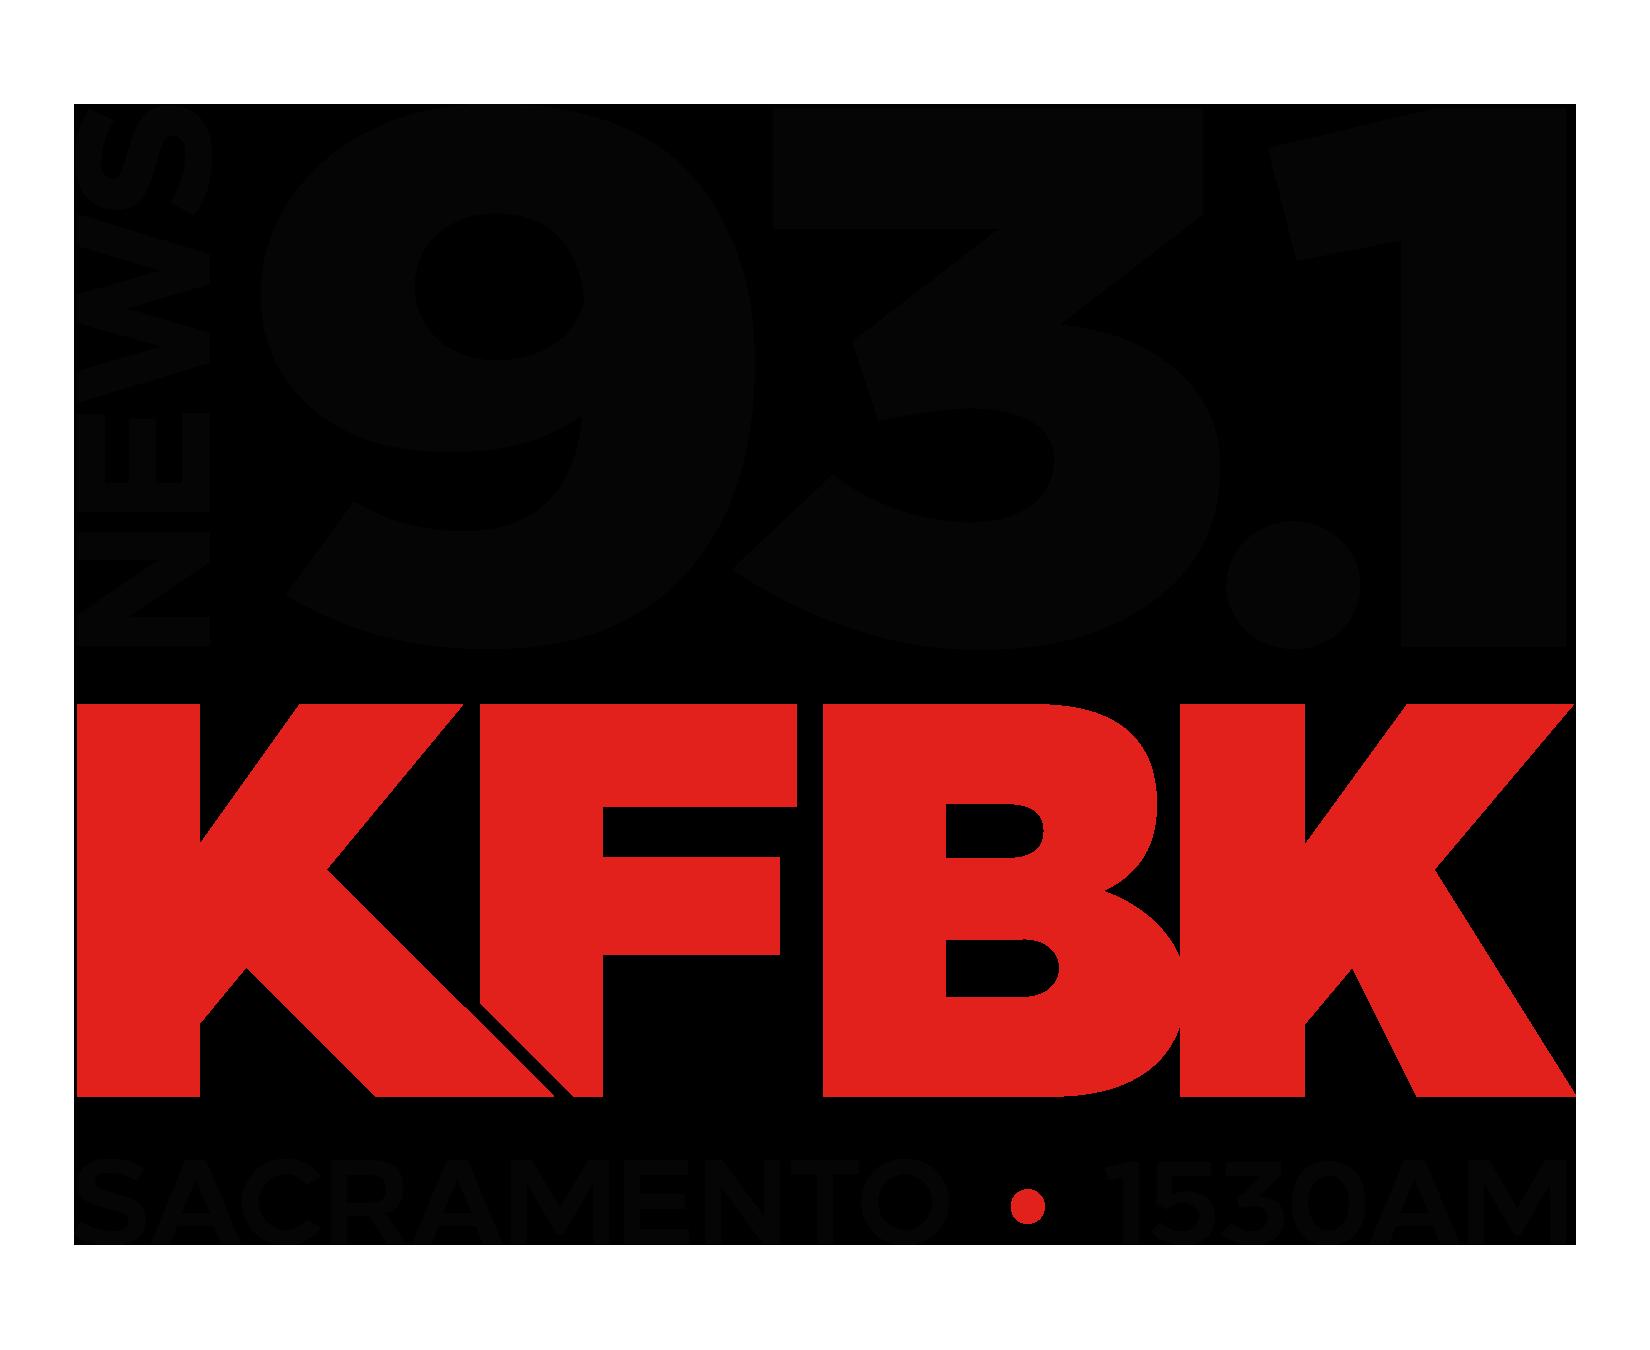 KFBK News Radio